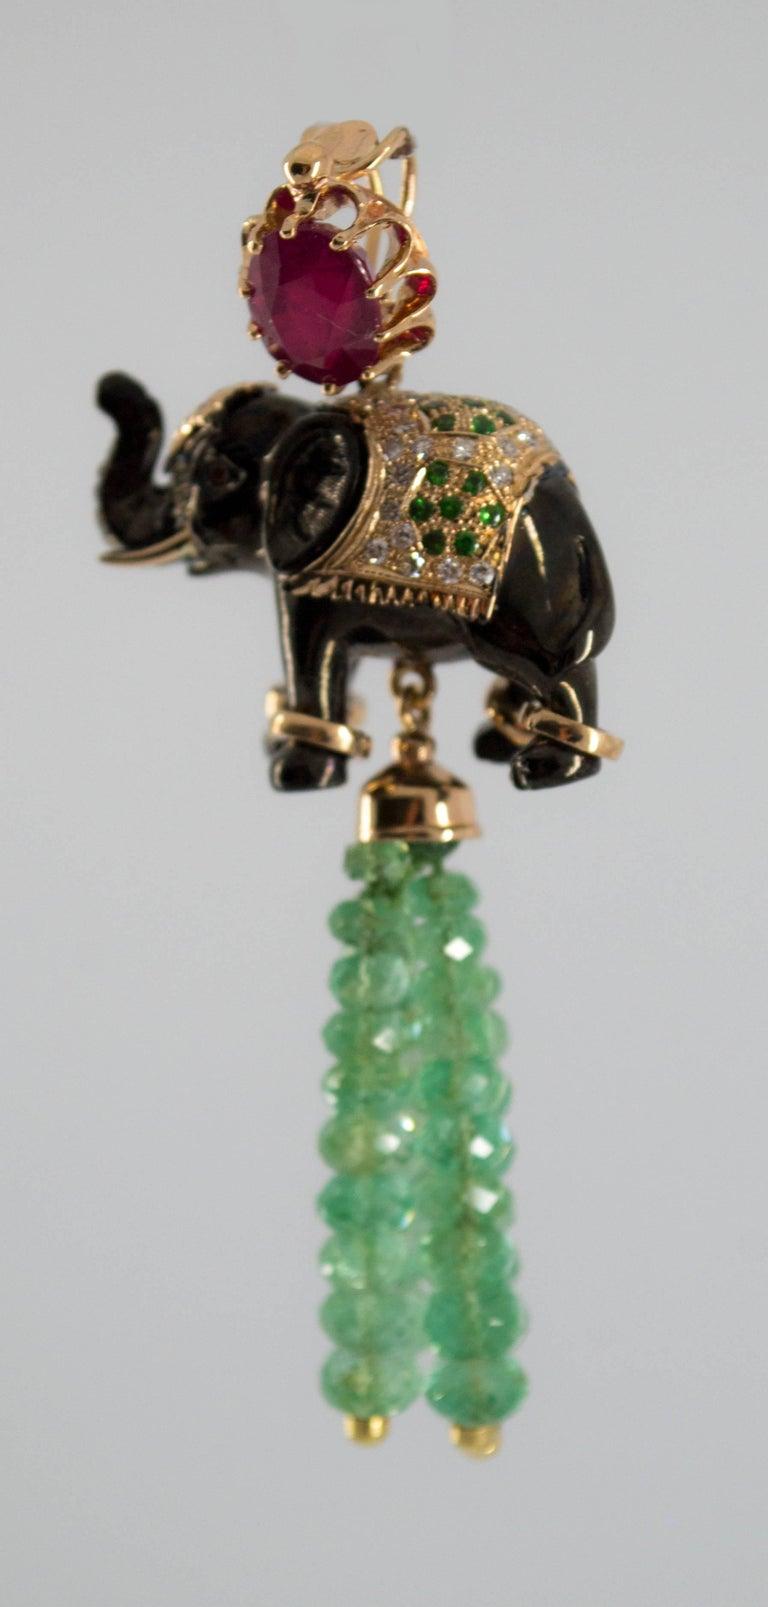 19.90 Carat Emerald 3.10 Carat Ruby Tsavorite Yellow Gold Elephant Pendant For Sale 2